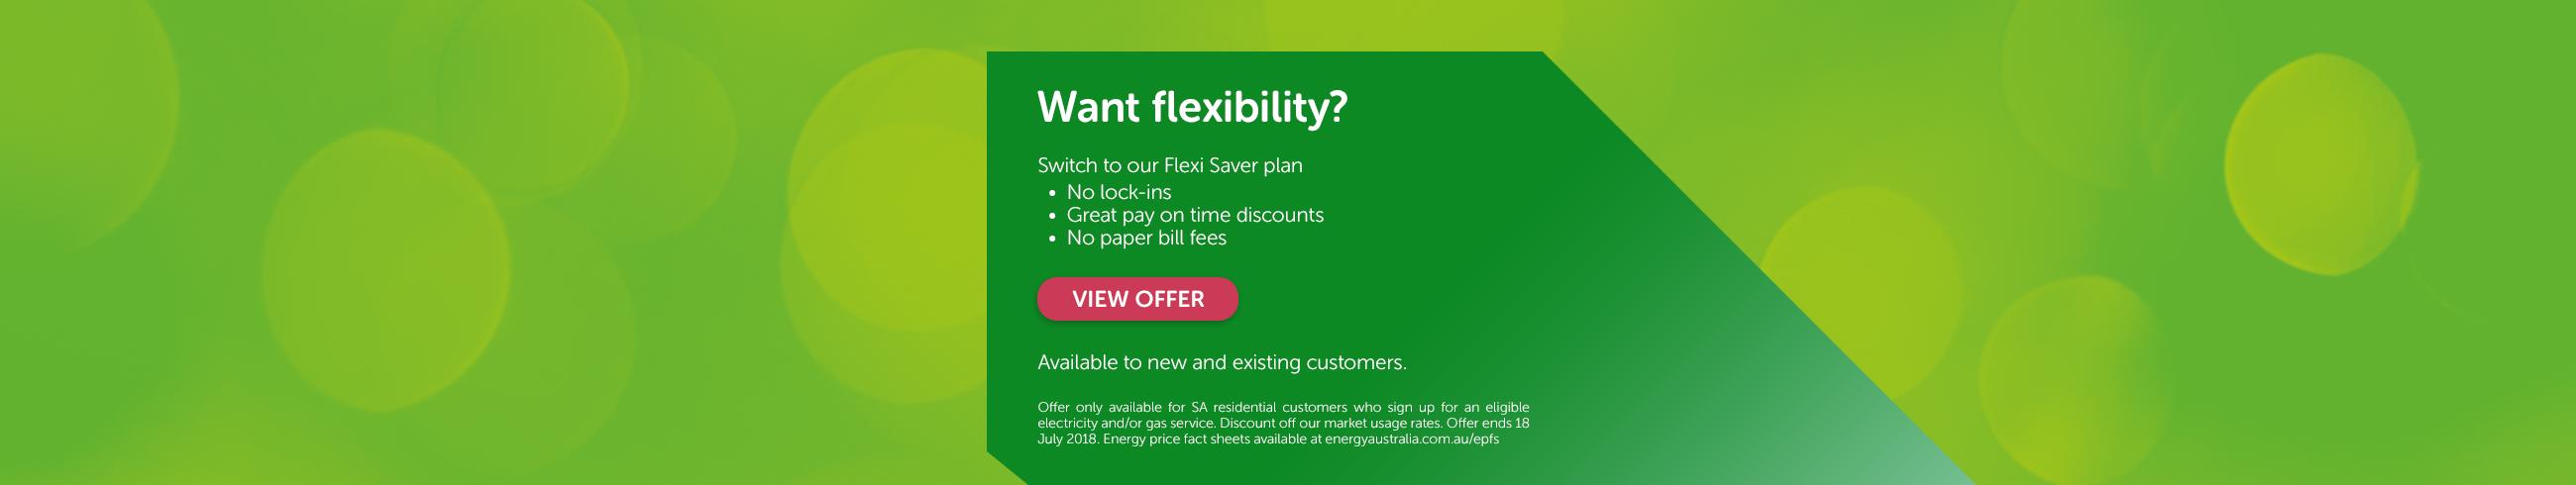 Want flexibility? Switch to our Flexi Saver plan